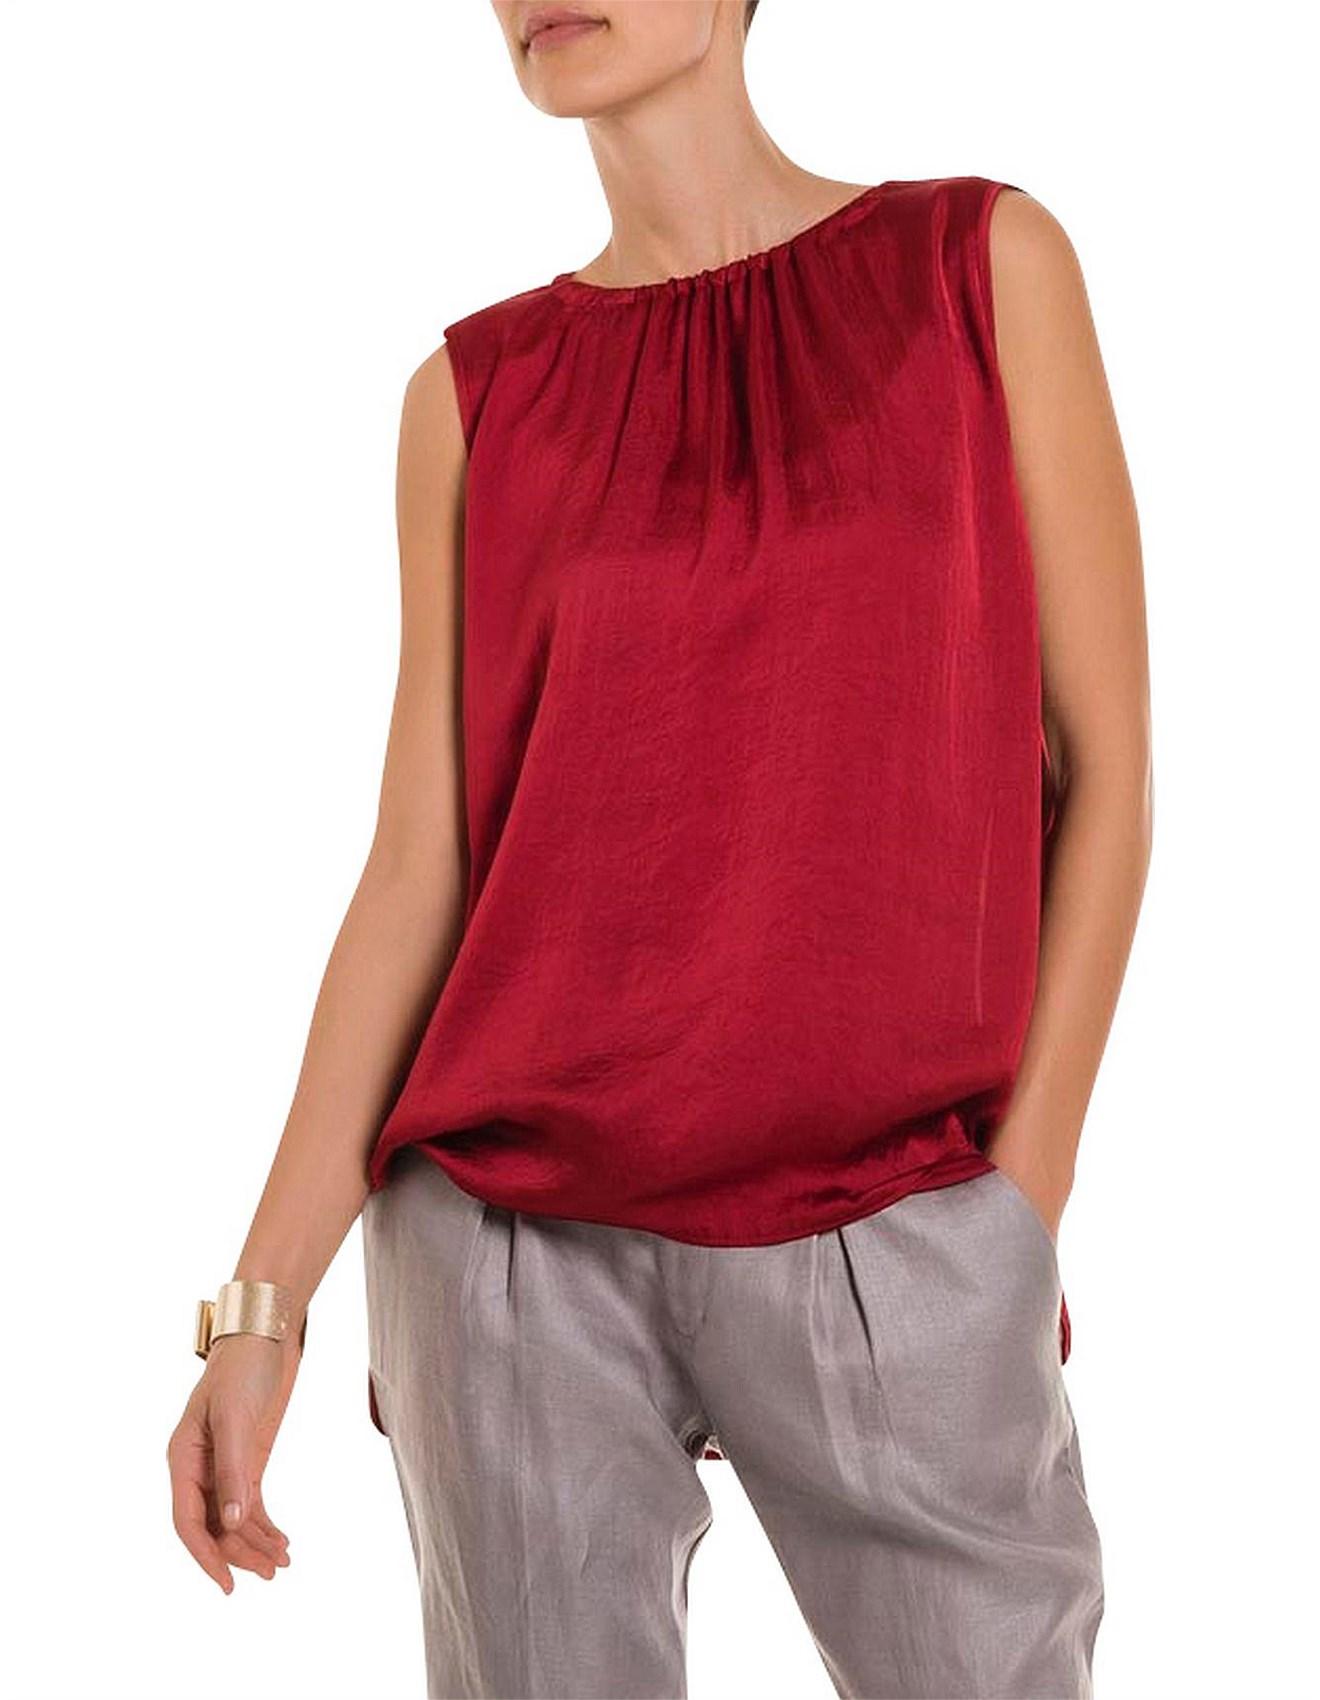 8ccb3318e7568 Women tops tanks shirts sweatshirts david jones jpg 1320x1700 Red satin tops